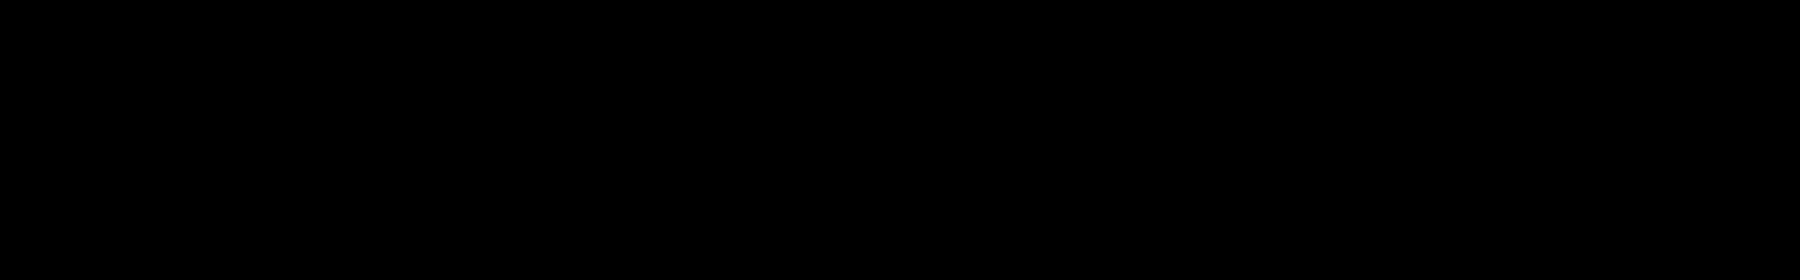 LAVINA audio waveform